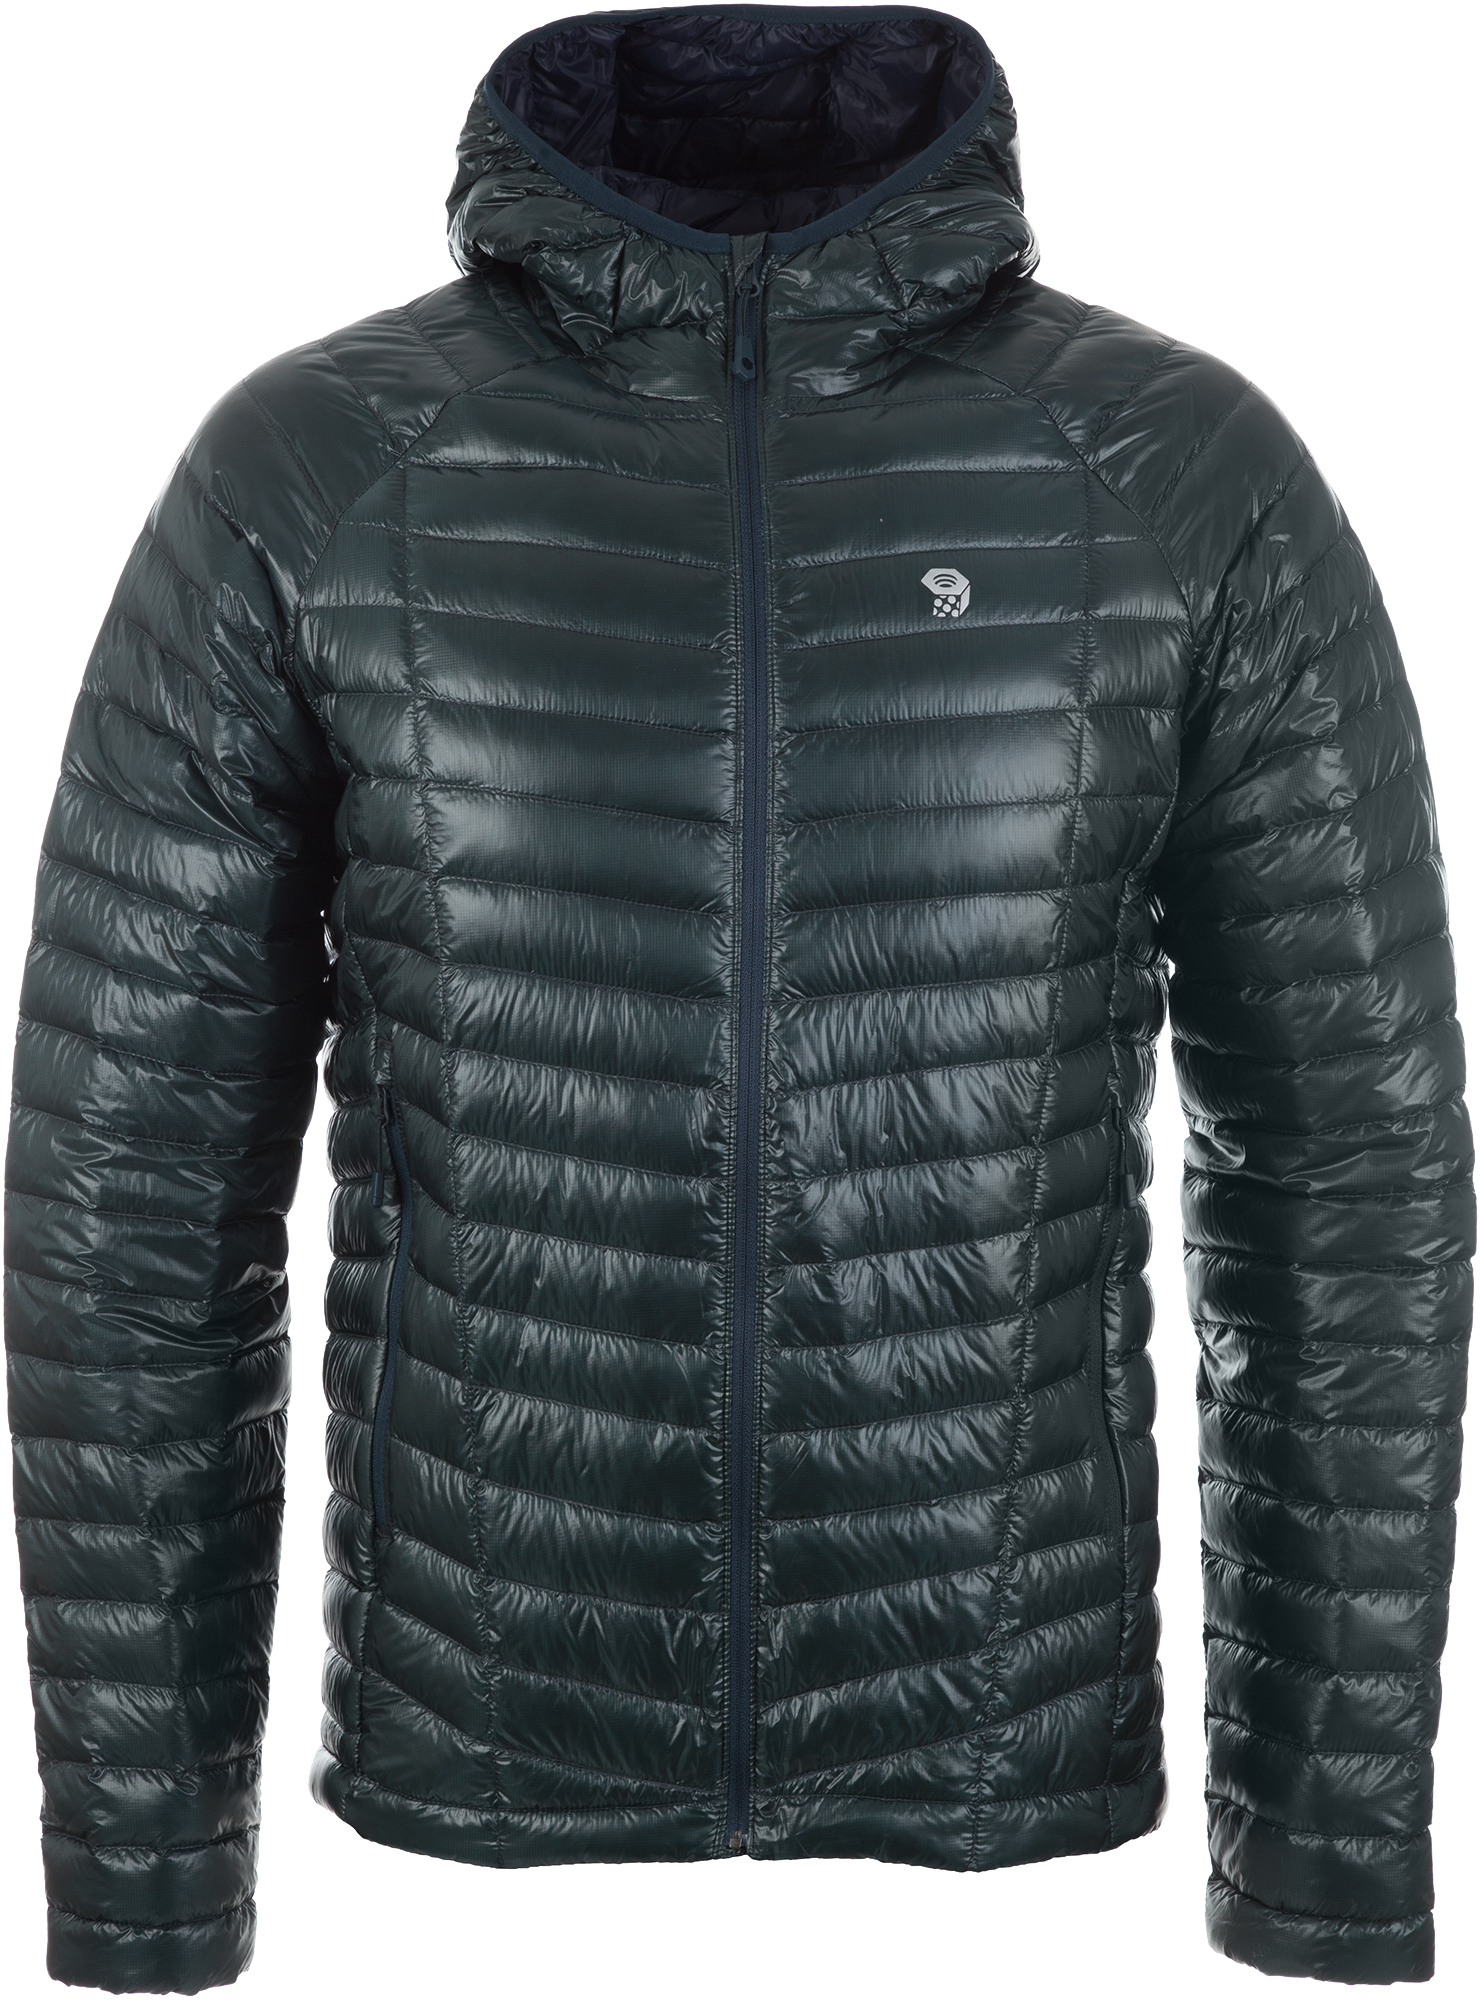 Mountain Hardwear Куртка пуховая мужская Mountain Hardwear Ghost Whisperer, размер 54